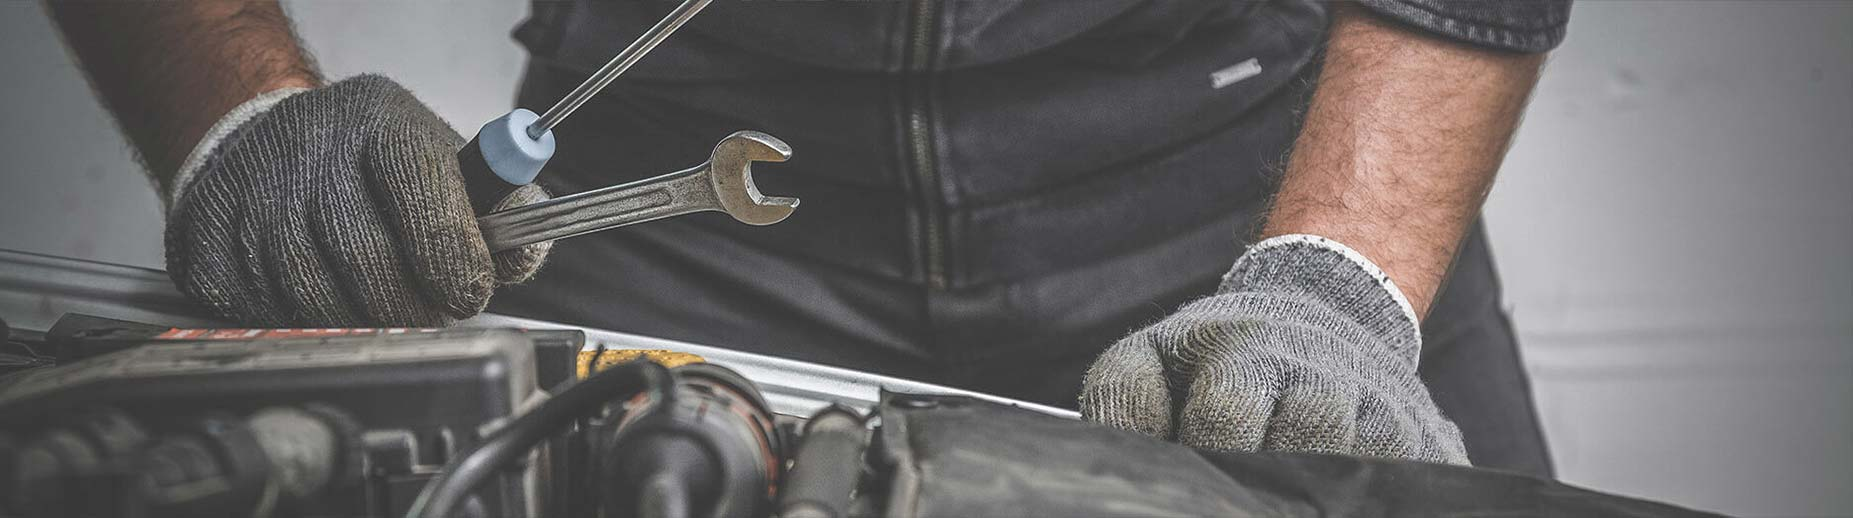 Concord Auto Repair, Auto Mechanic and Diesel Mechanic